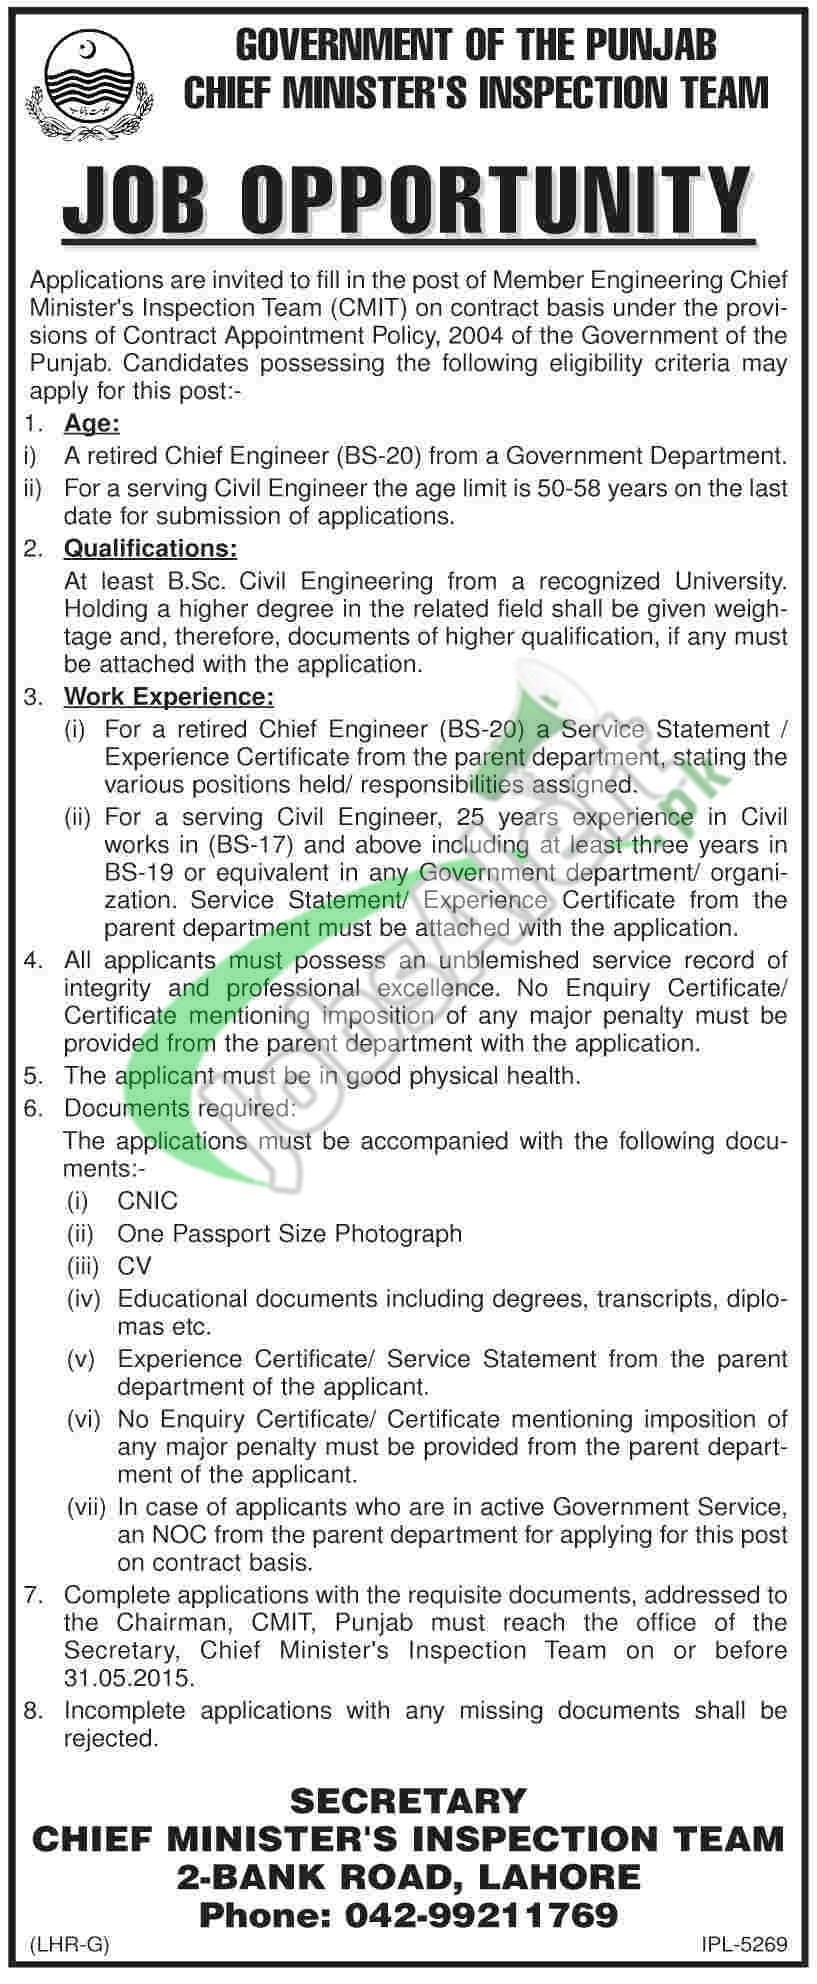 Chief Minister Inspection Team CMIT Punjab Jobs